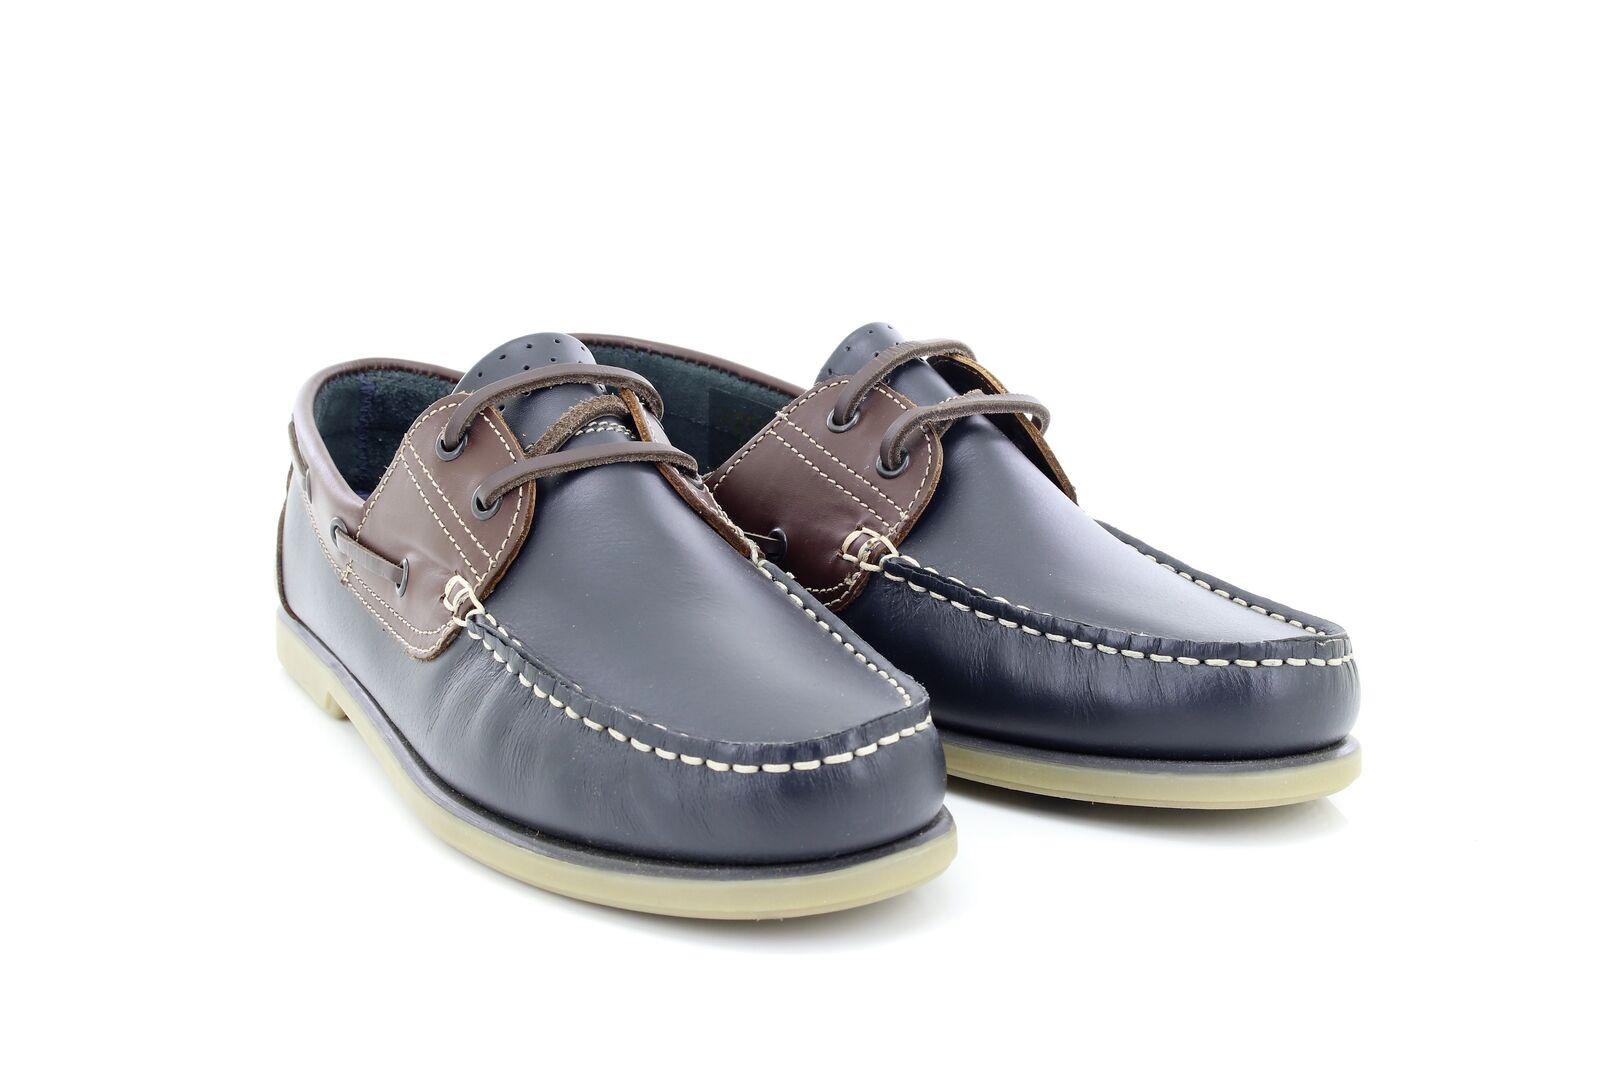 Mens Dek M551 Smart Leather Moccasin Boat zapatos